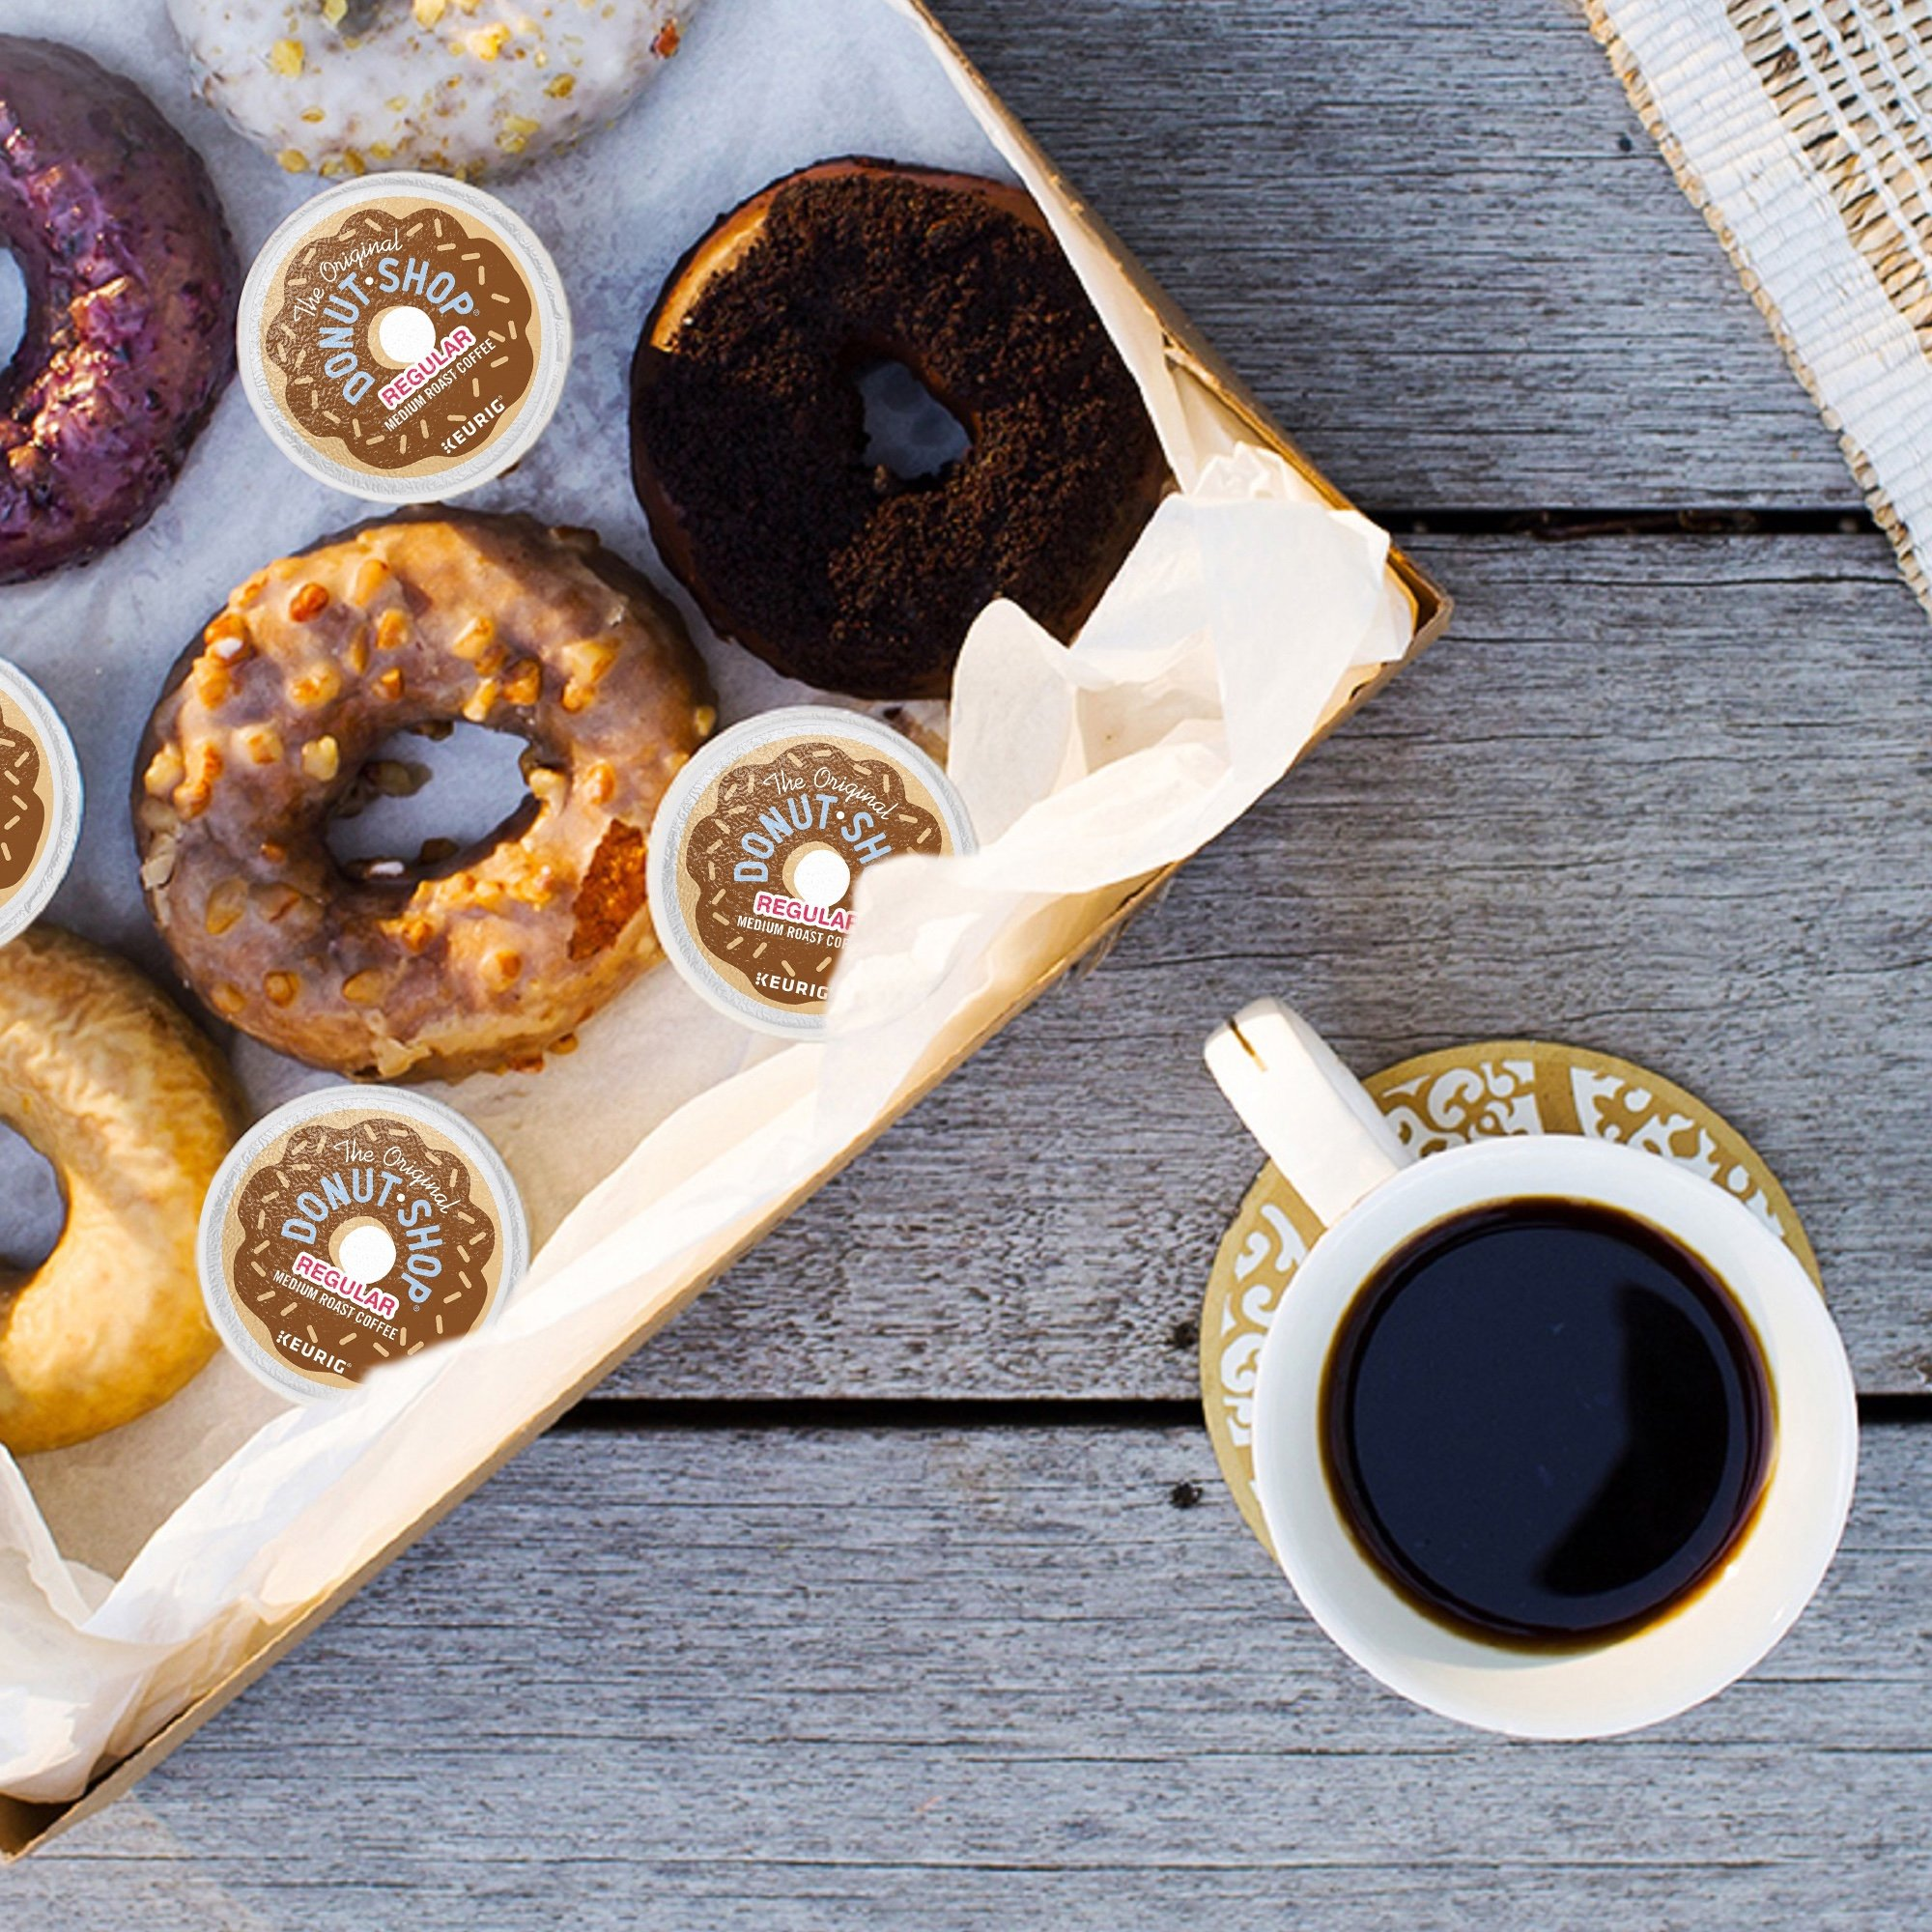 The Original Donut Shop Coffee, Regular Medium Roast, K-Cup Portion Count for Keurig Brewers 24-Count (Pack of 4) by The Original Donut Shop (Image #12)